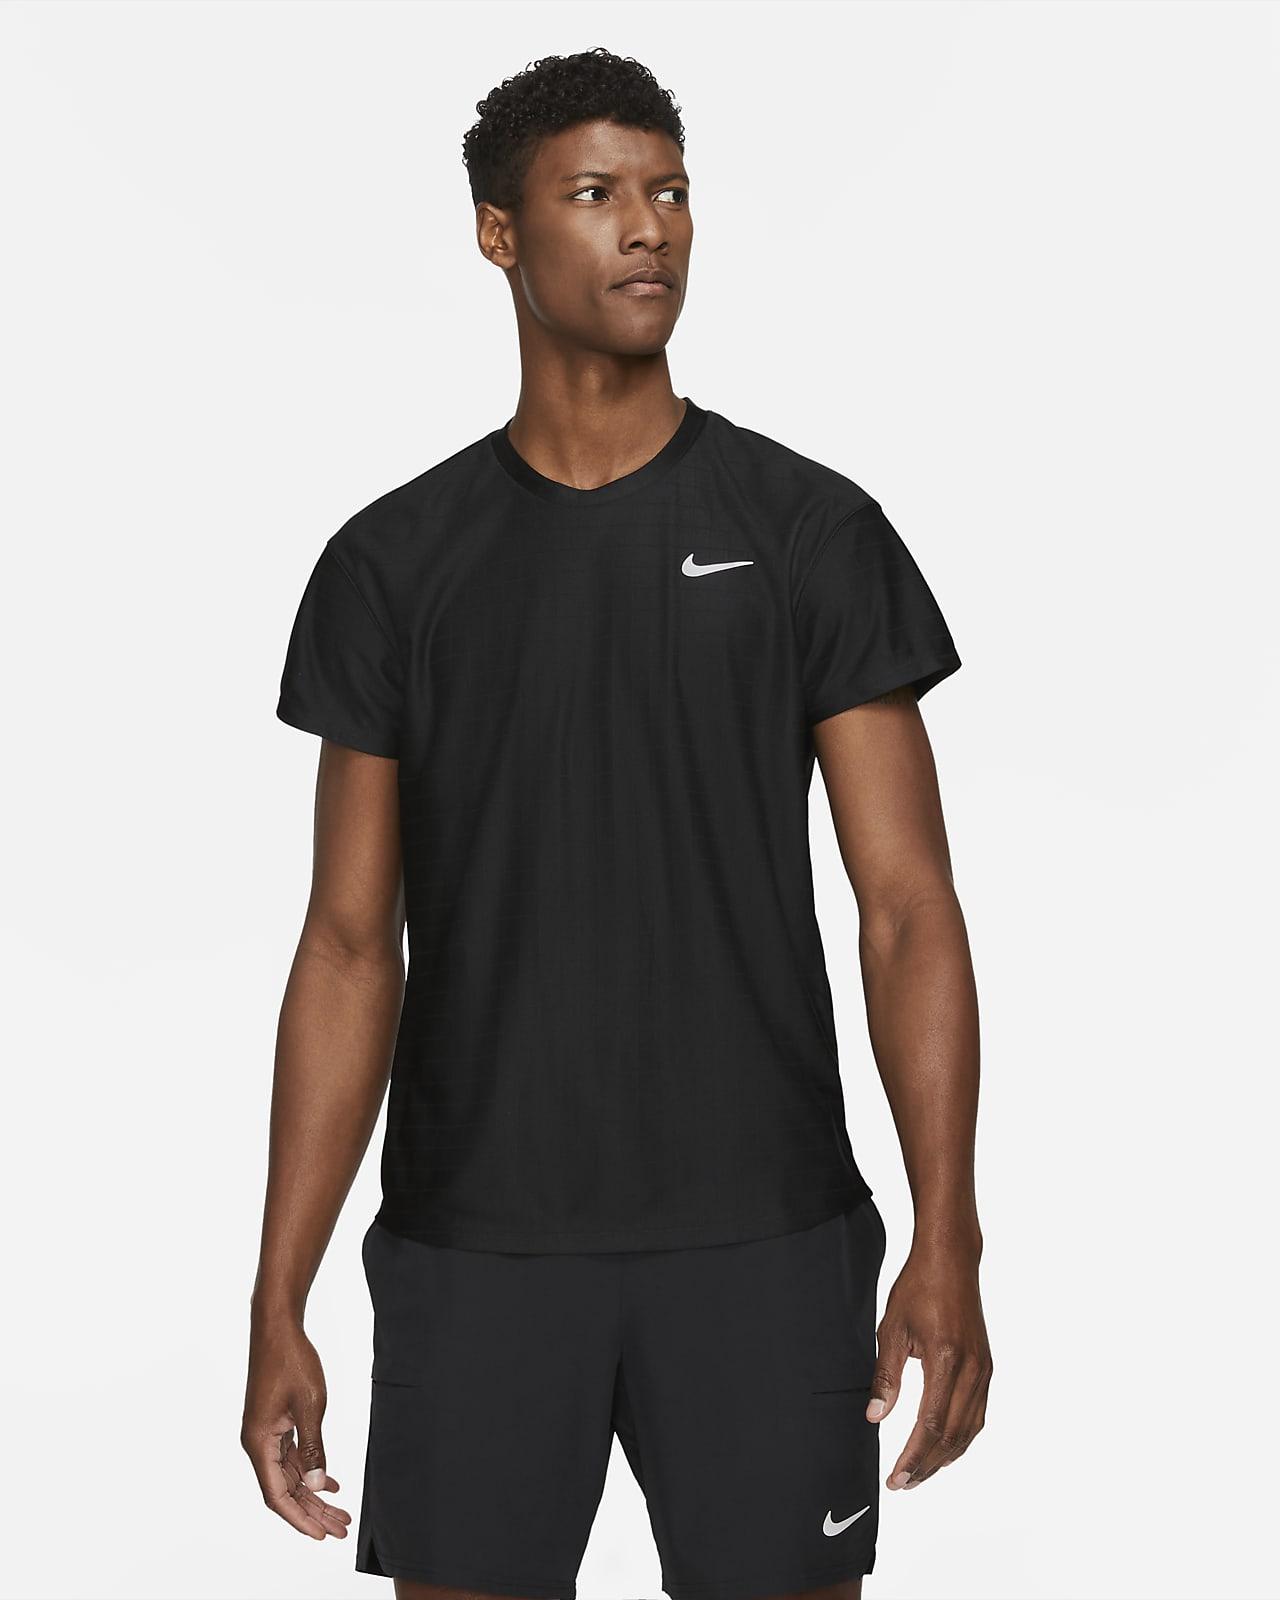 NikeCourt Dri-FIT Advantage Herren-Tennisoberteil